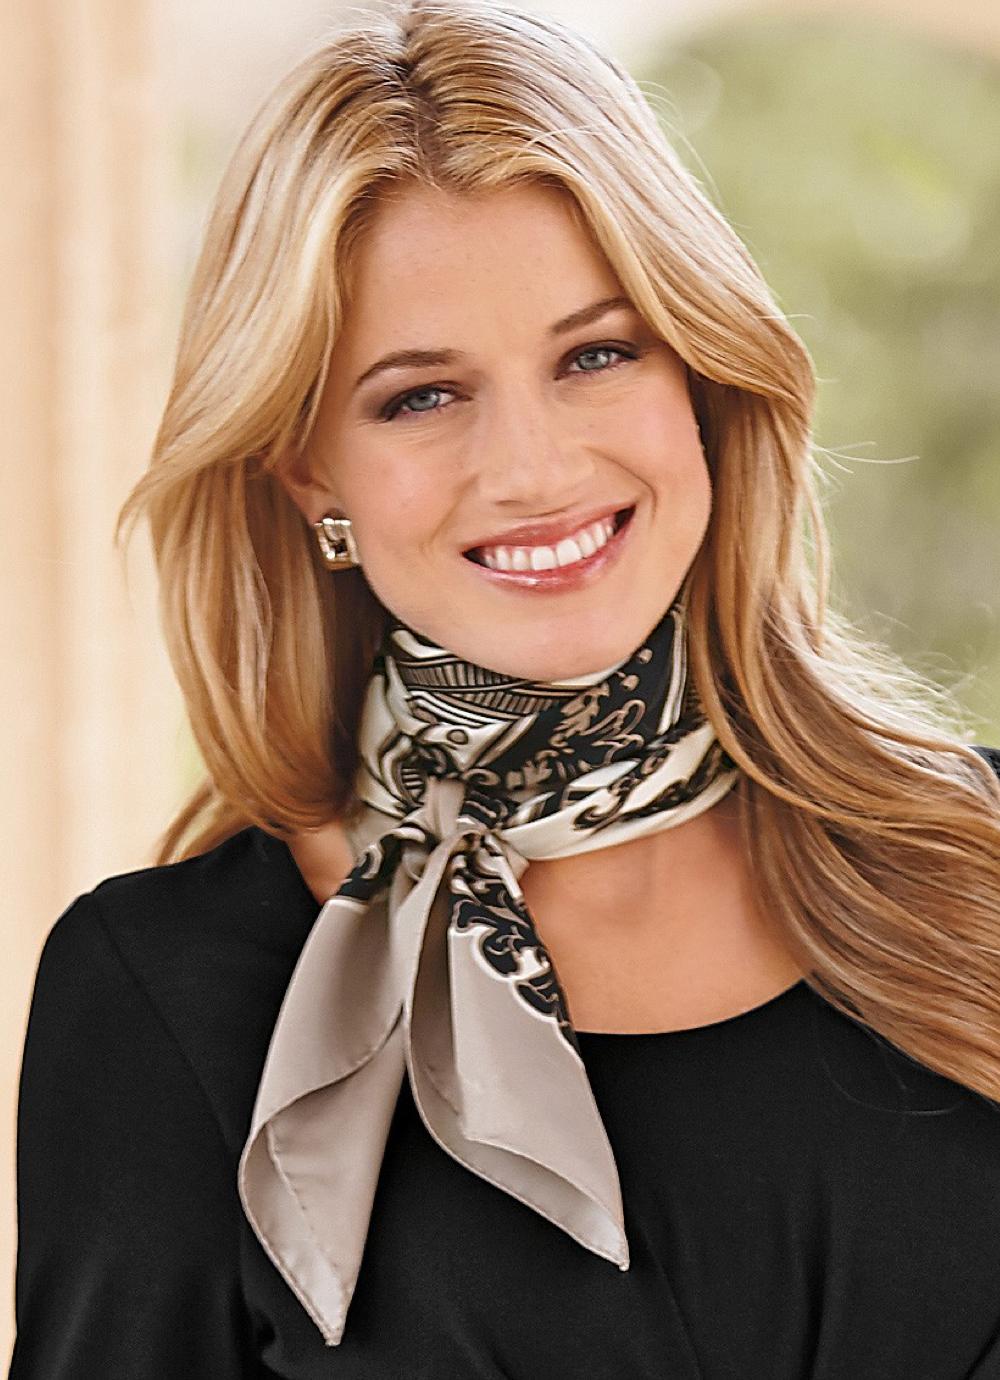 Tied neck scarf Add Sinchi - Be Chic... www ...